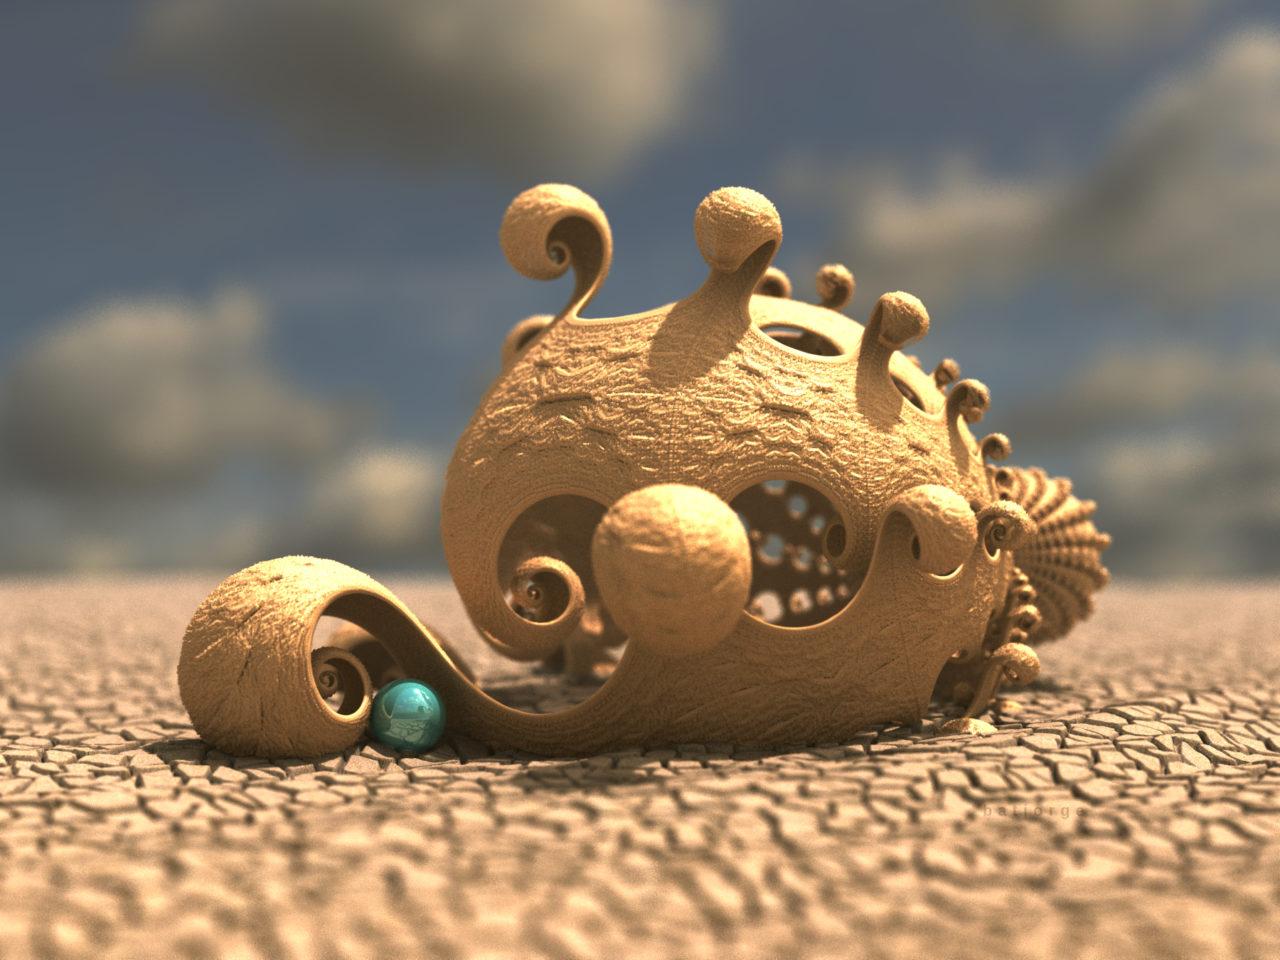 3d fractal. kleinian. mandelbulber with sphere. desertic